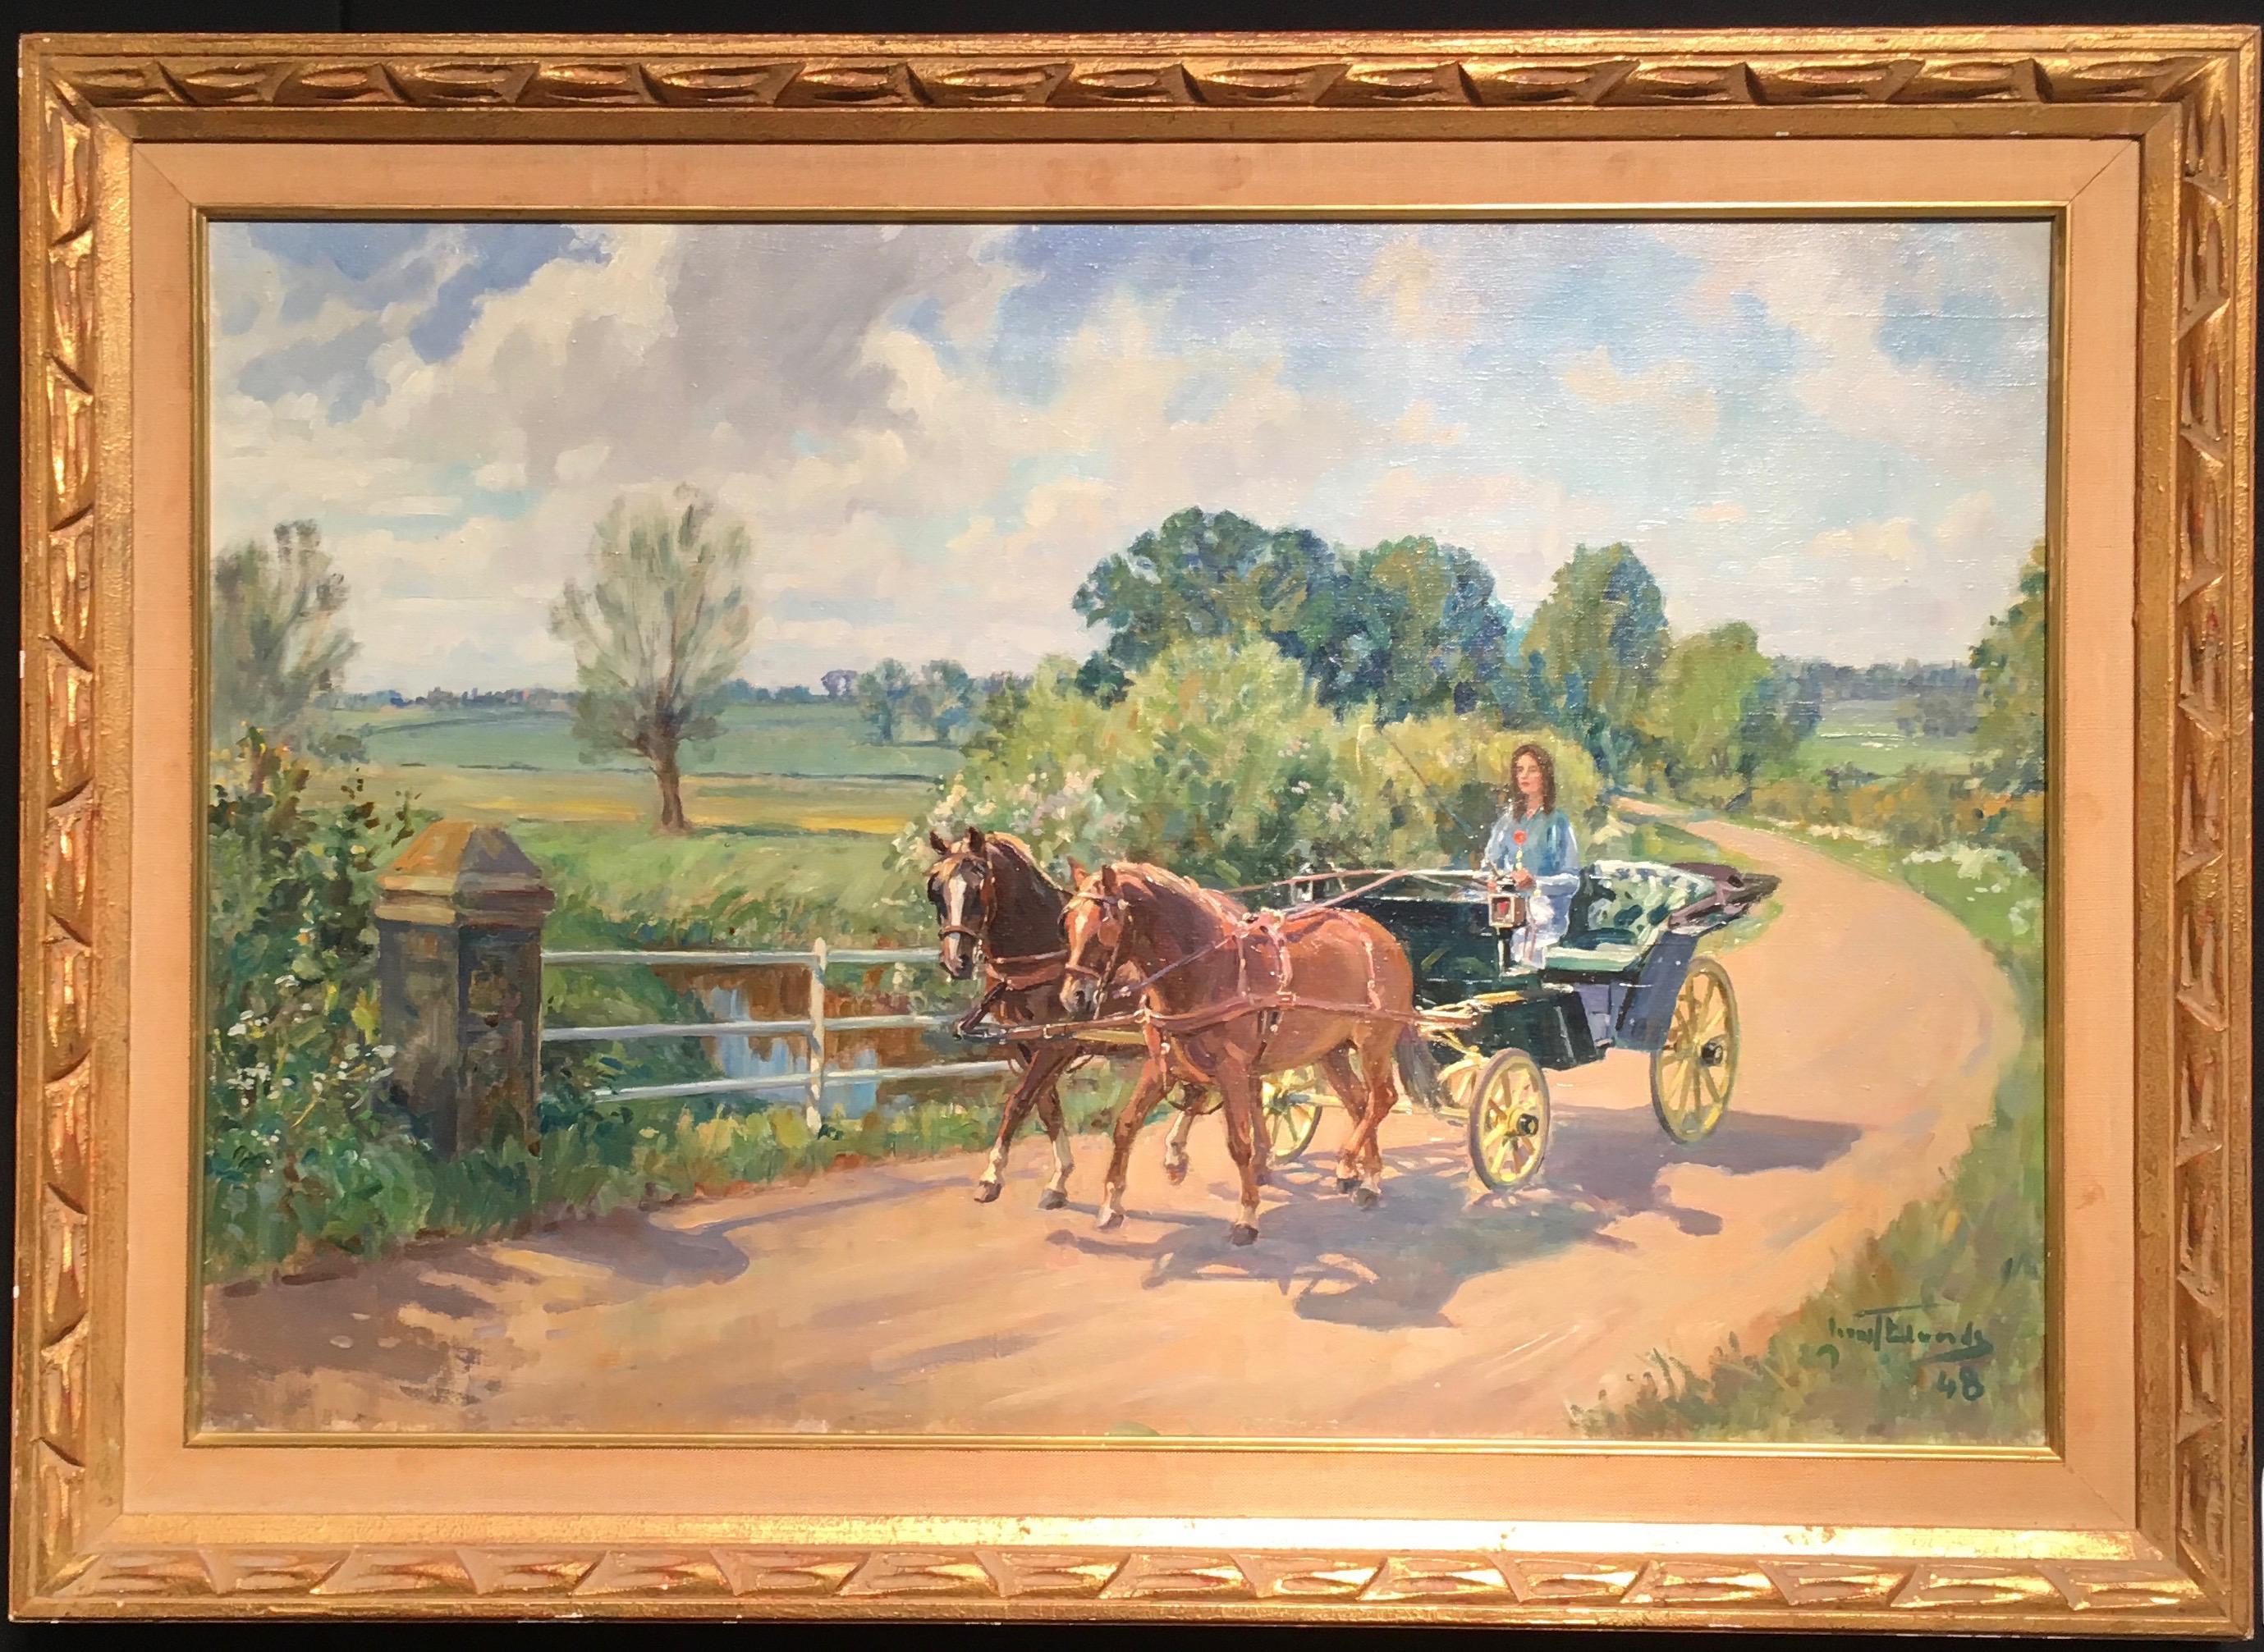 English lady in a horse drawn buggy trotting through an Impressionist landscape